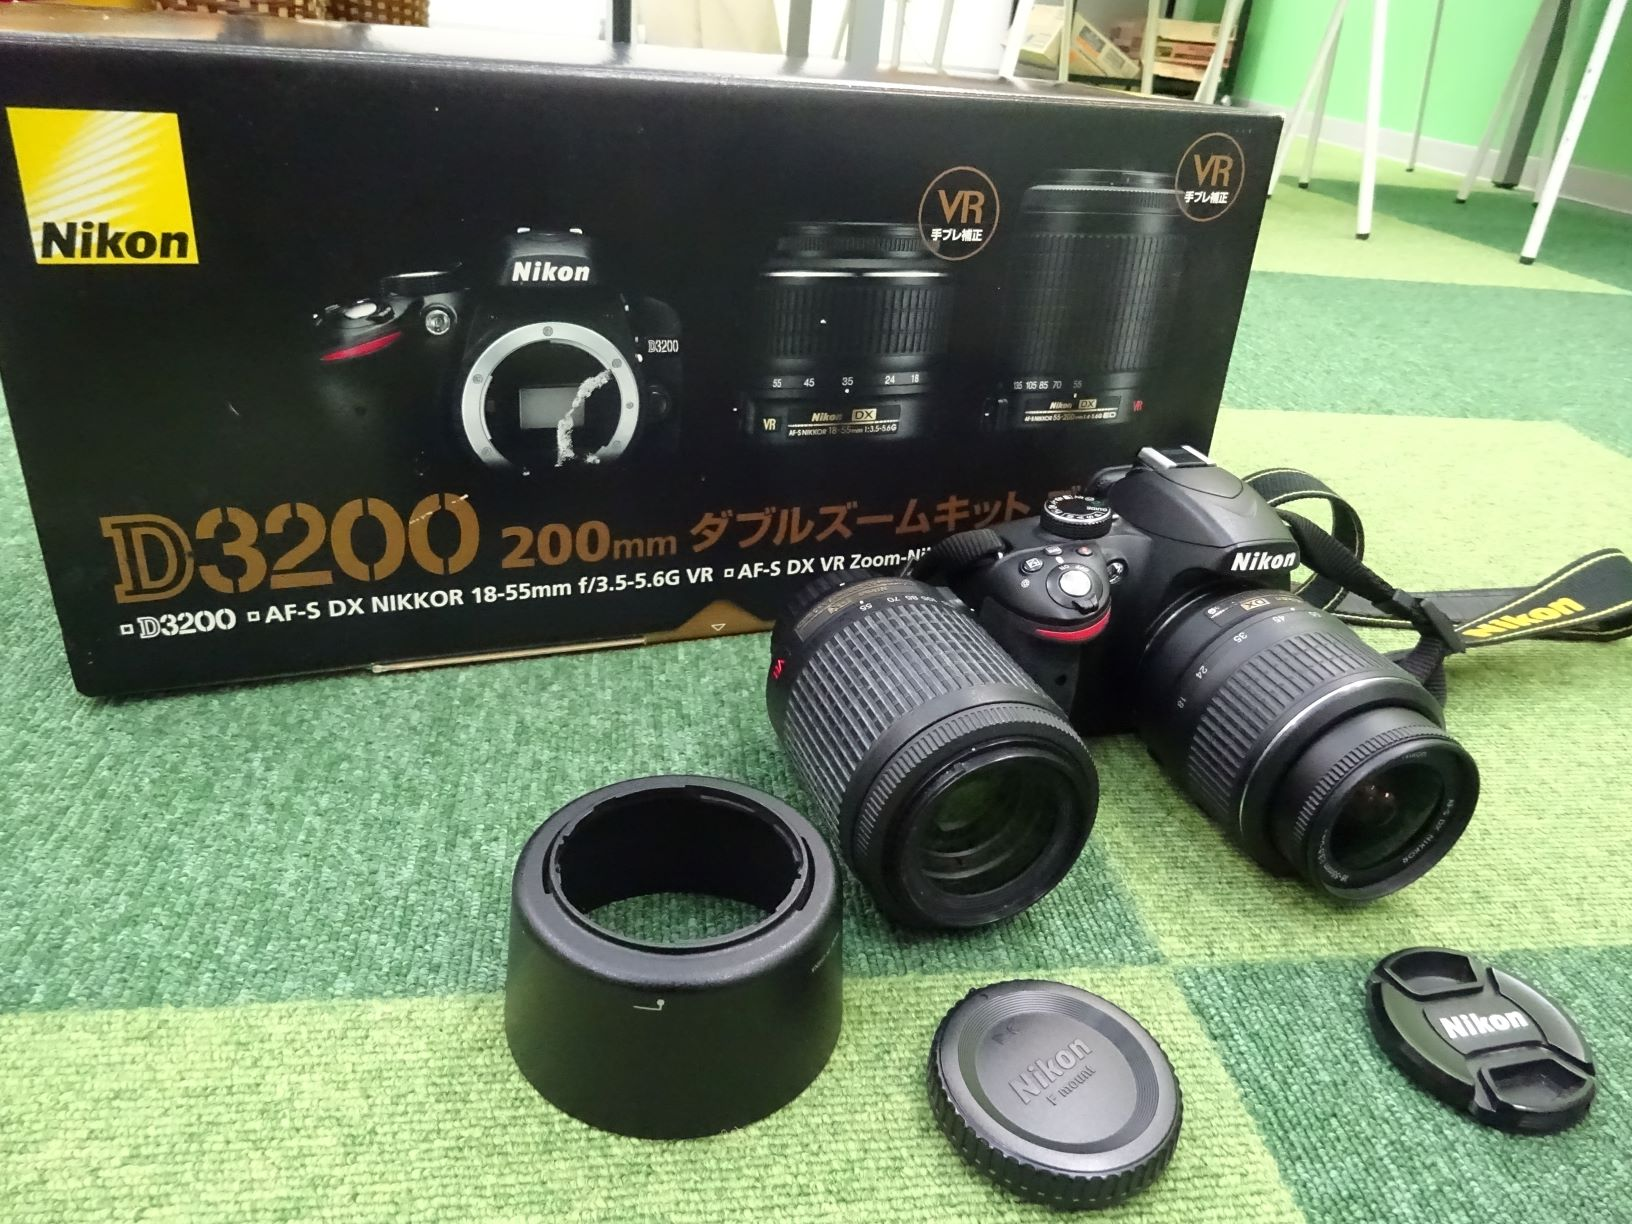 Nikonカメラ D3200